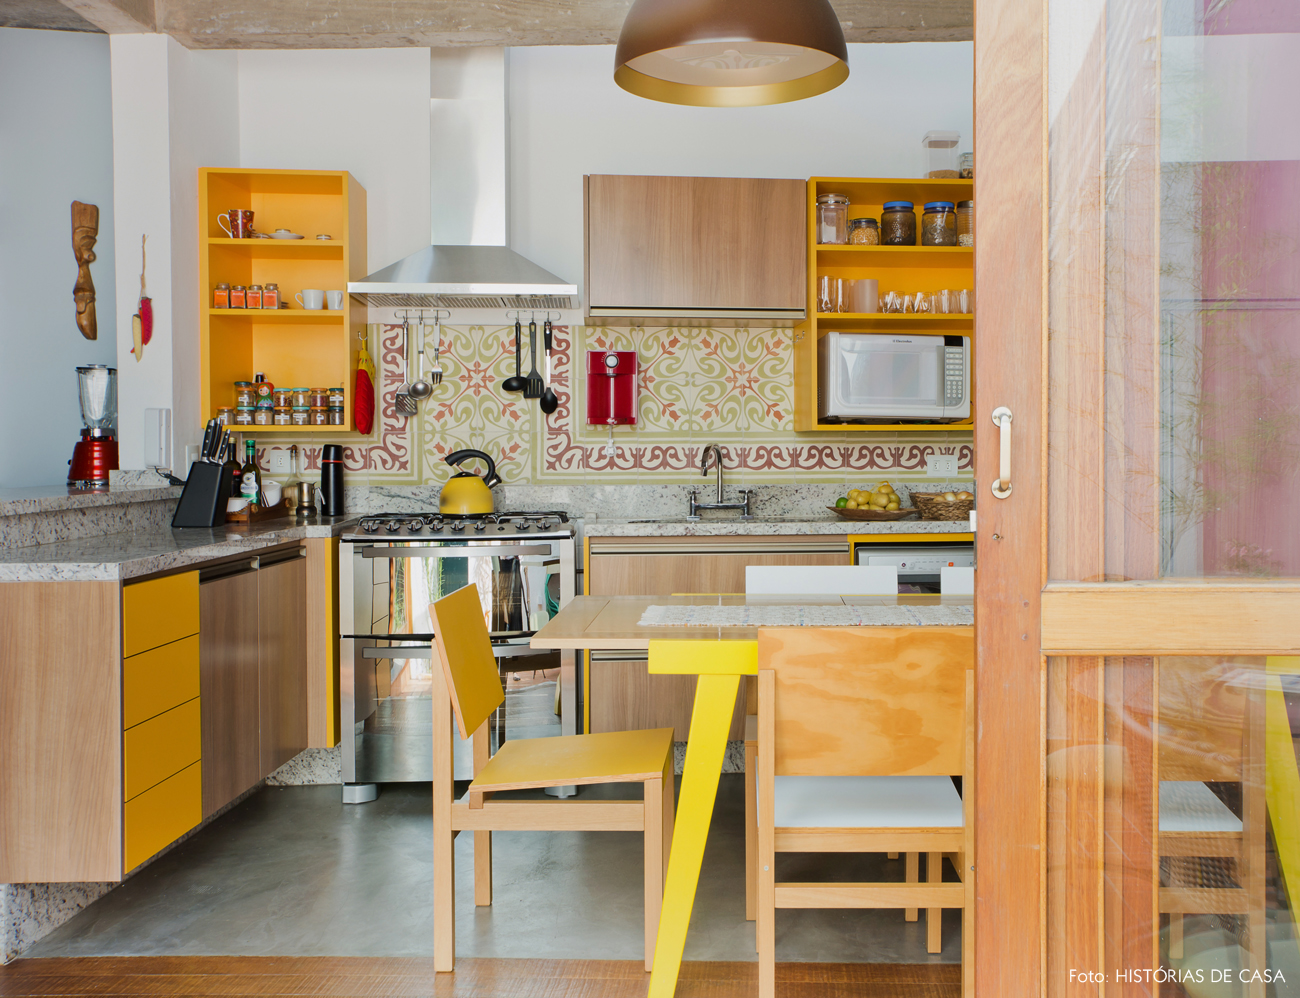 03-decoracao-cozinha-amarela-ladrilhos-hidraulicos-no-frontao